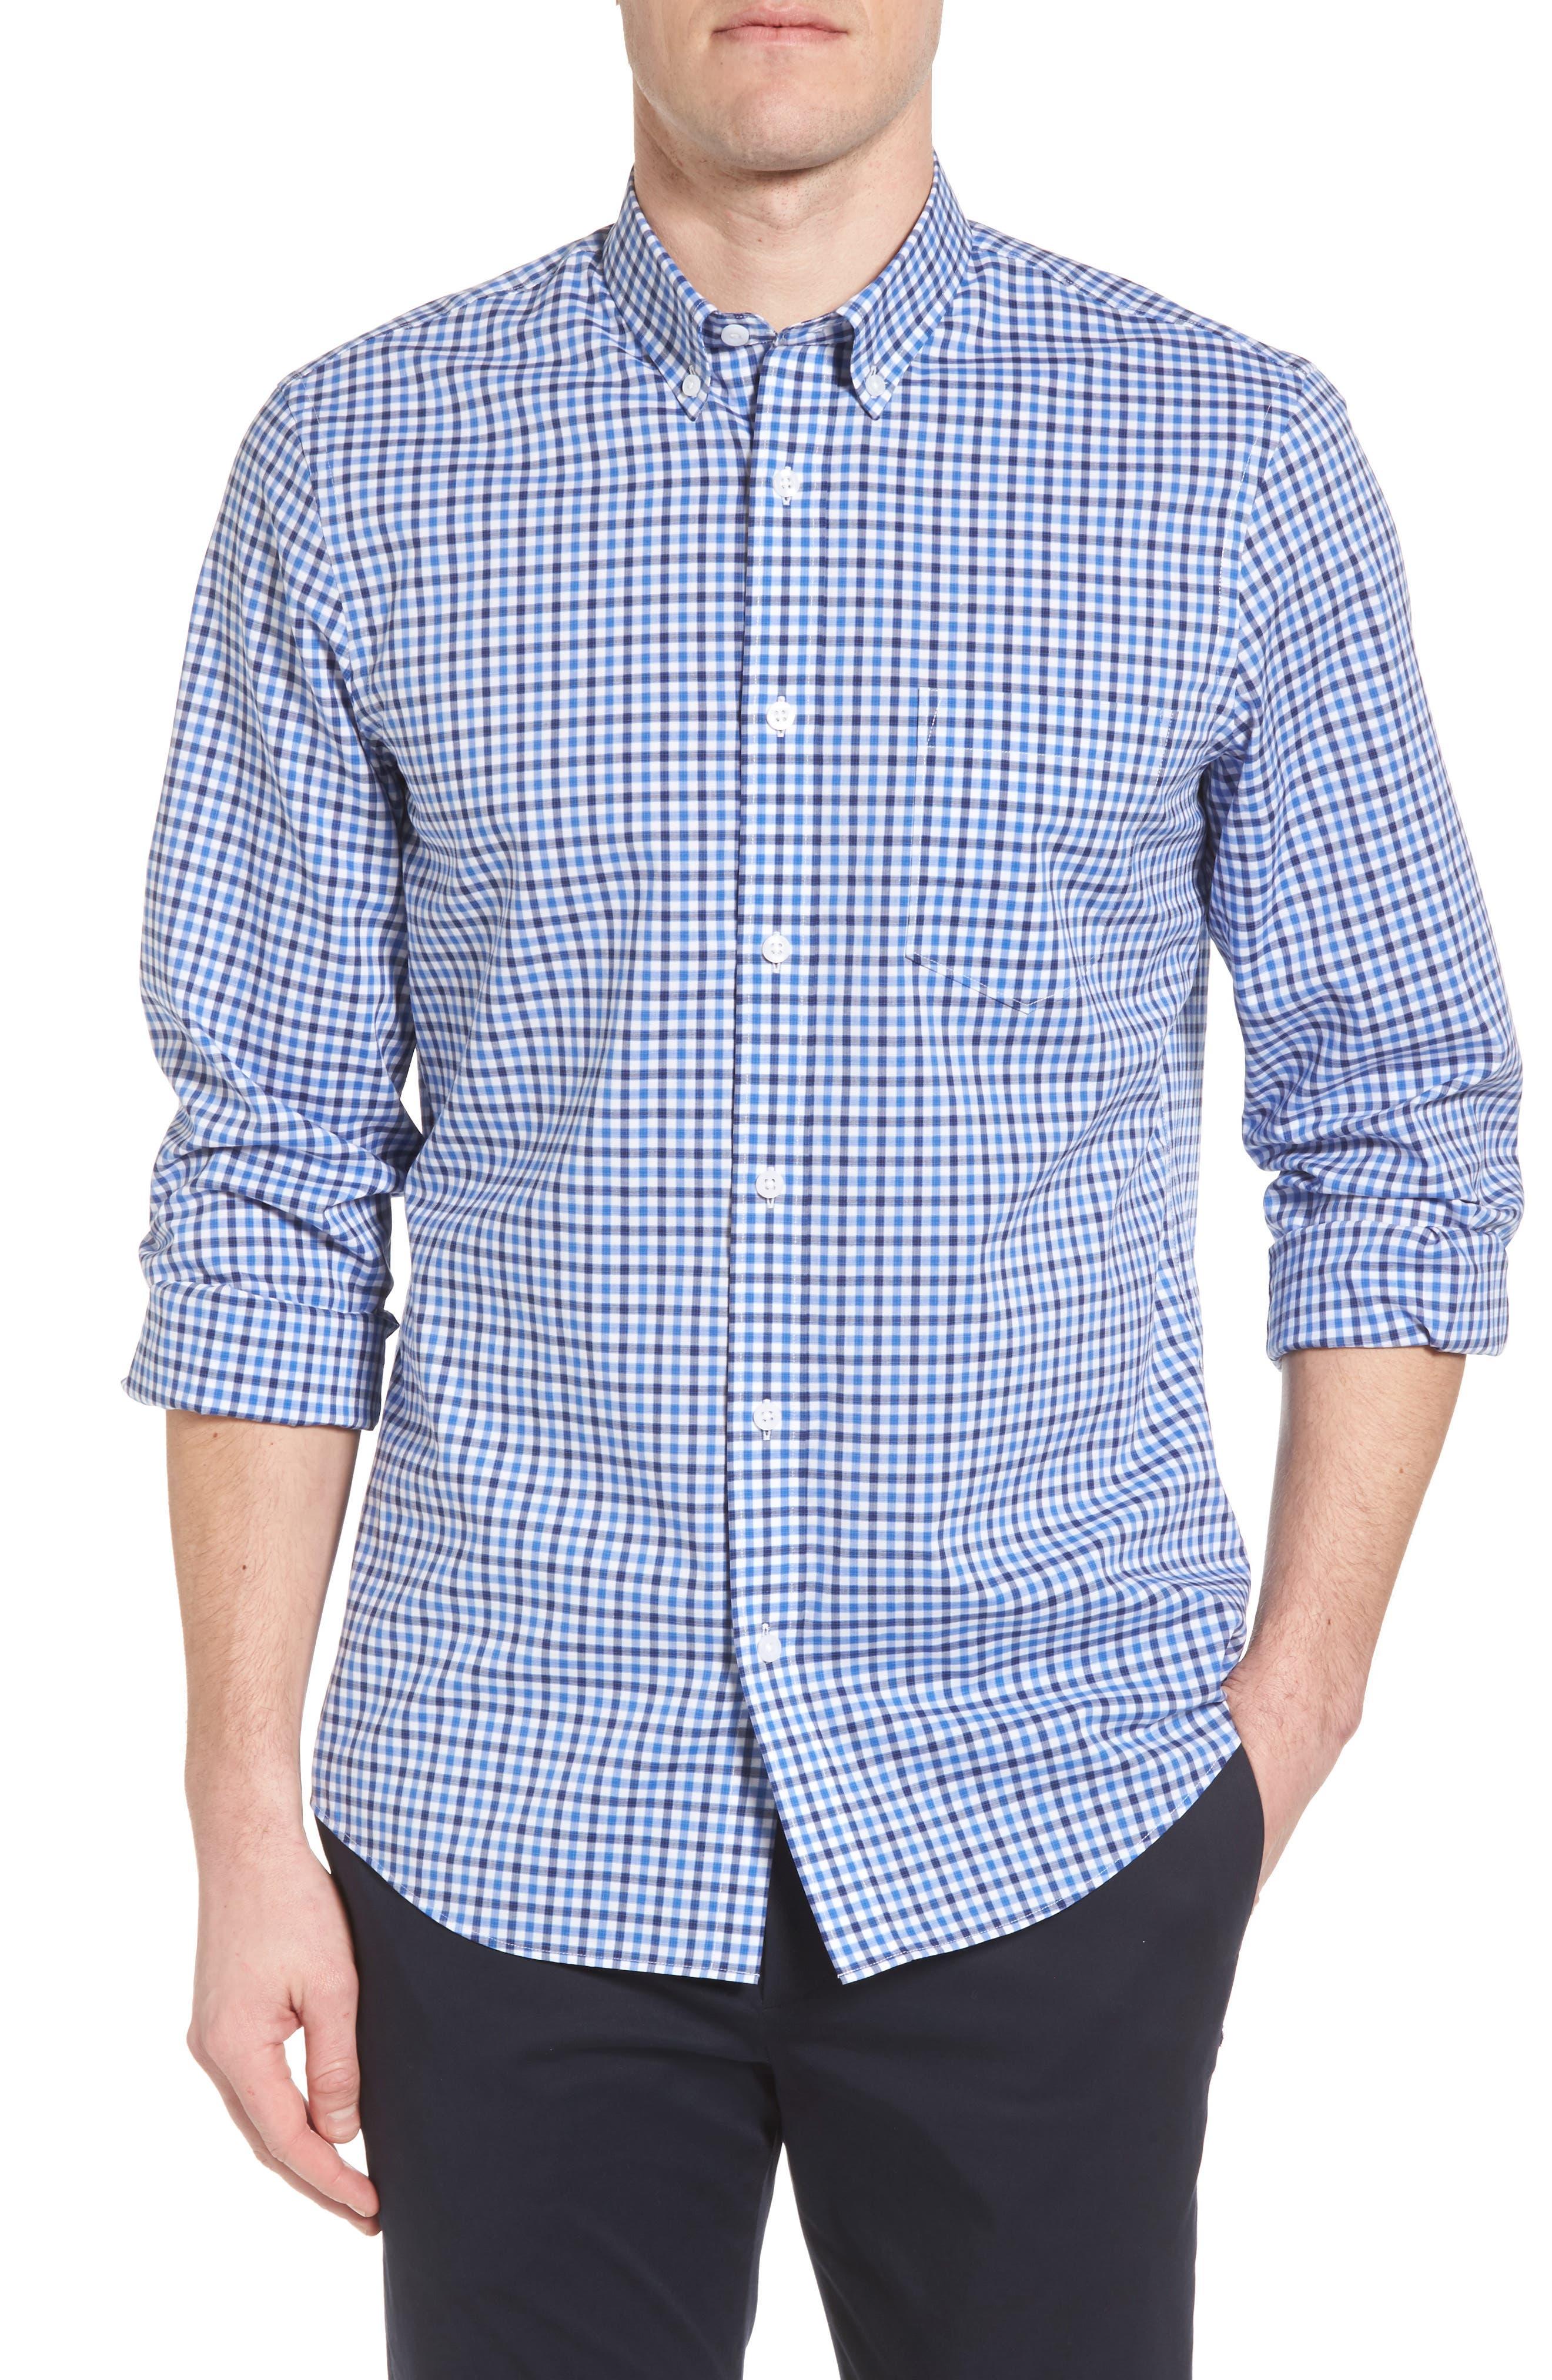 Tech-Smart Regular Fit Check Sport Shirt,                             Main thumbnail 1, color,                             Blue Camp Navy Check